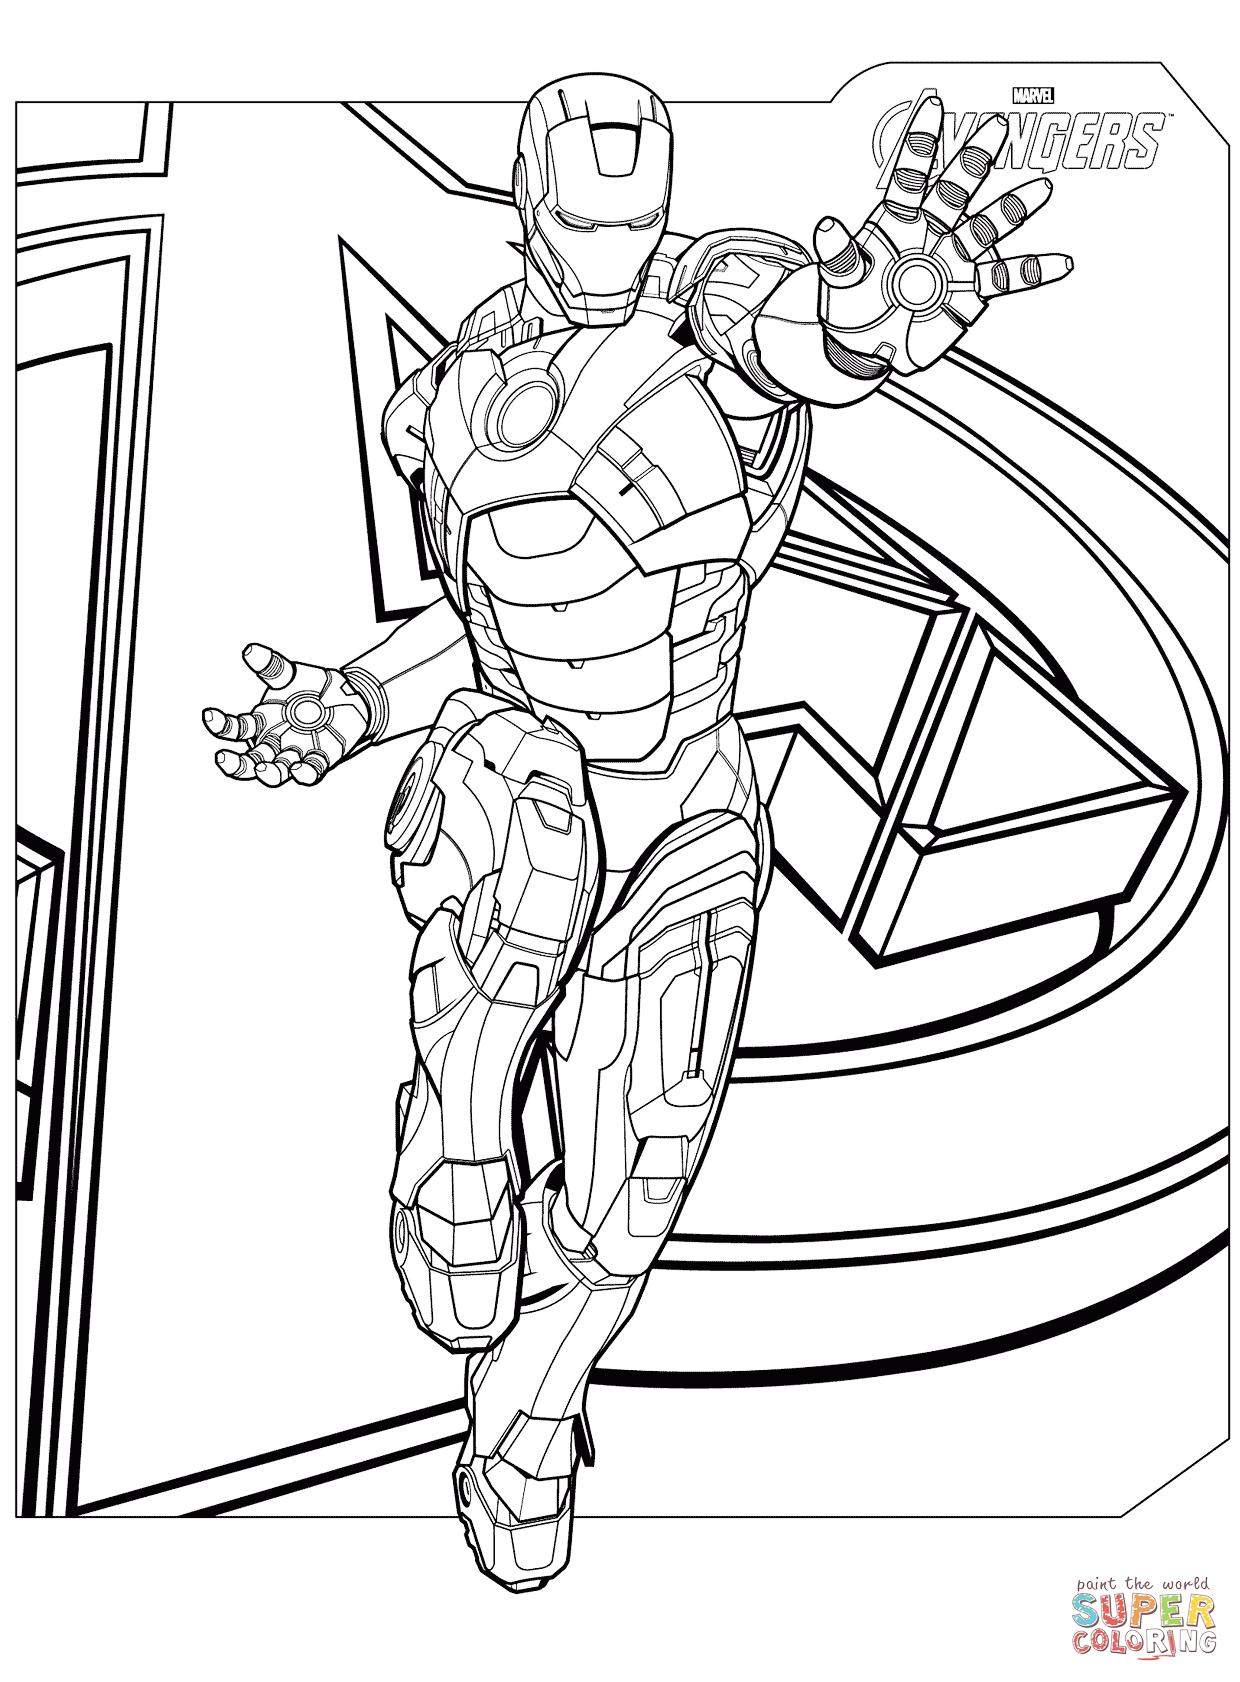 Avengers coloring #5, Download drawings